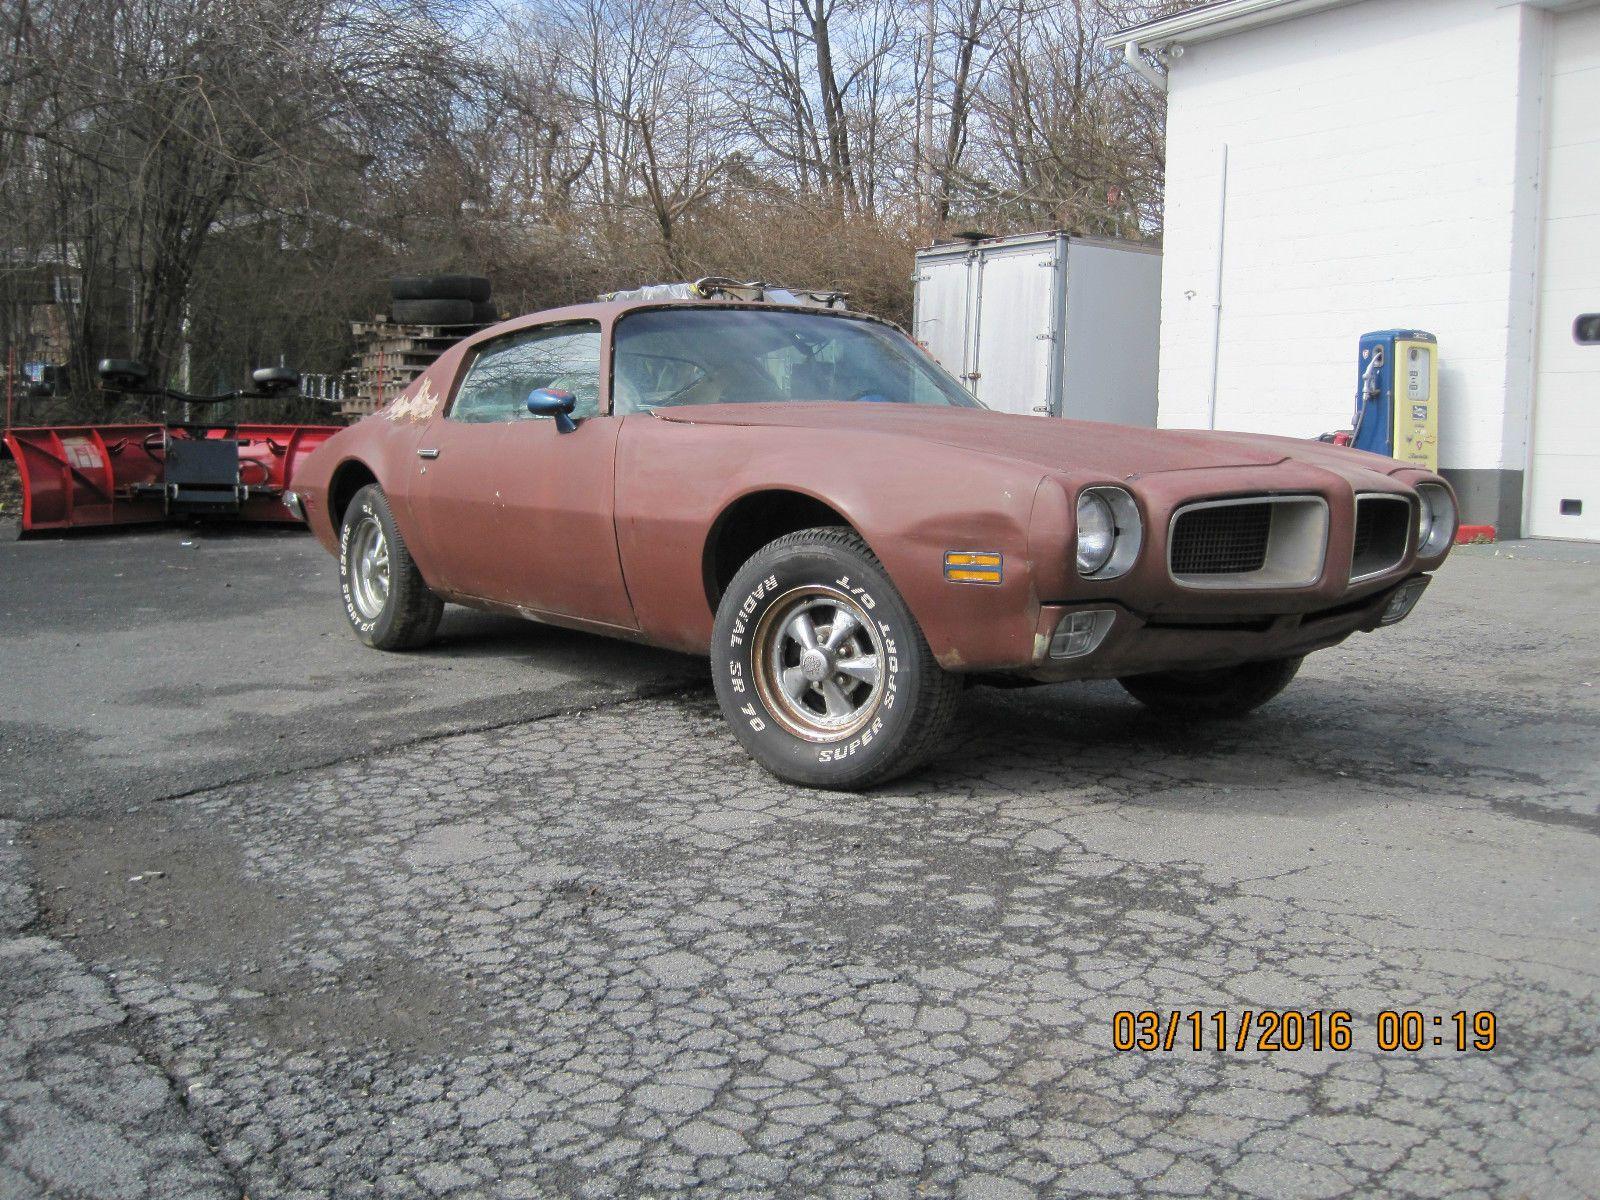 1972 Pontiac Firebird Trans Am Project Car Maintenance/restoration ...